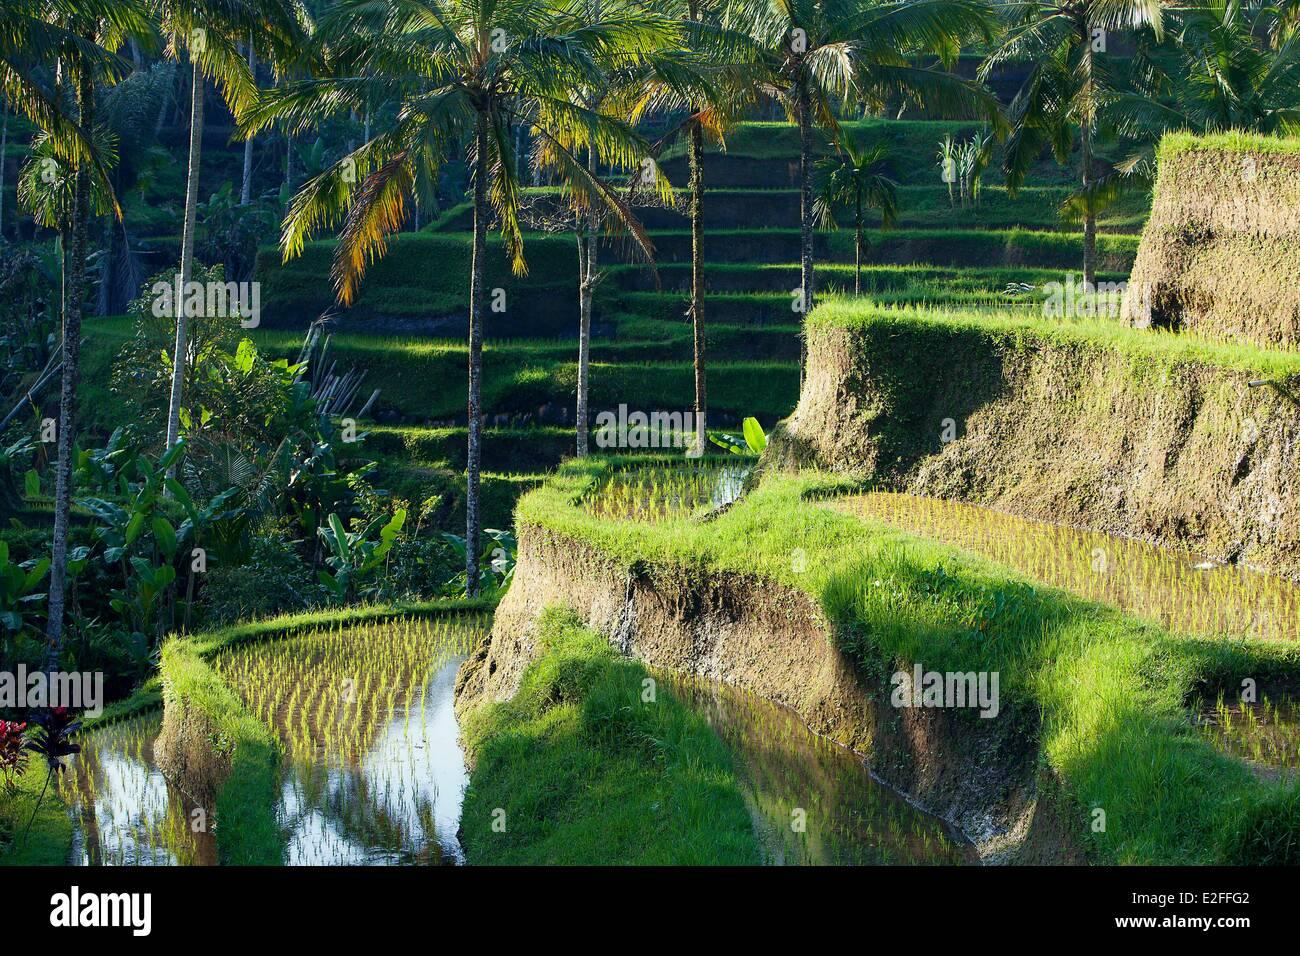 Indonesia, Bali, near Ubud, Tegalalang, rice field - Stock Image